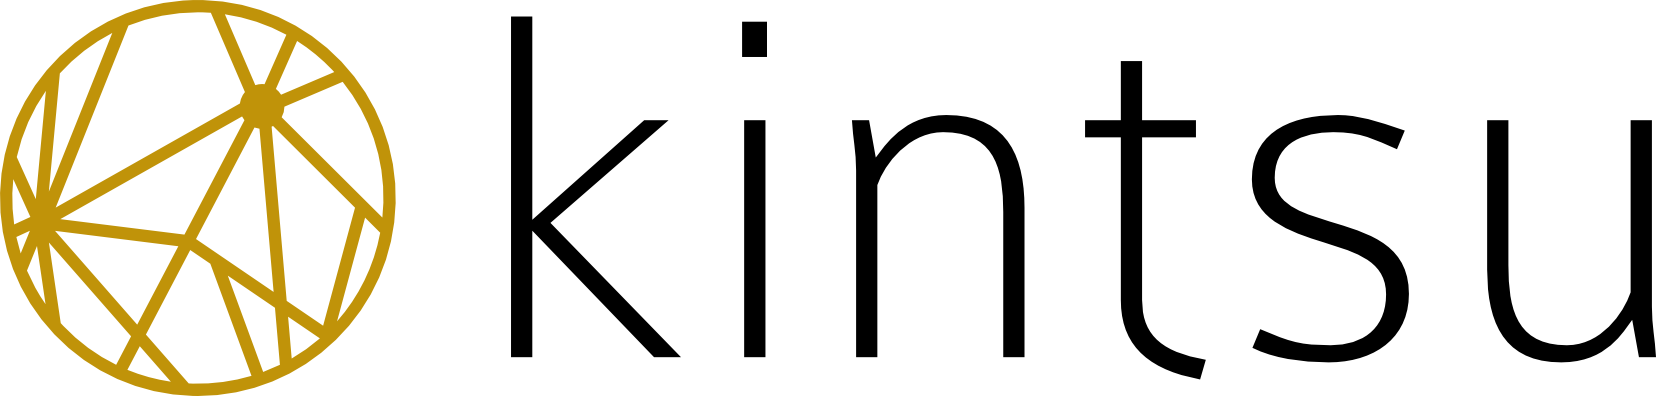 kintsu